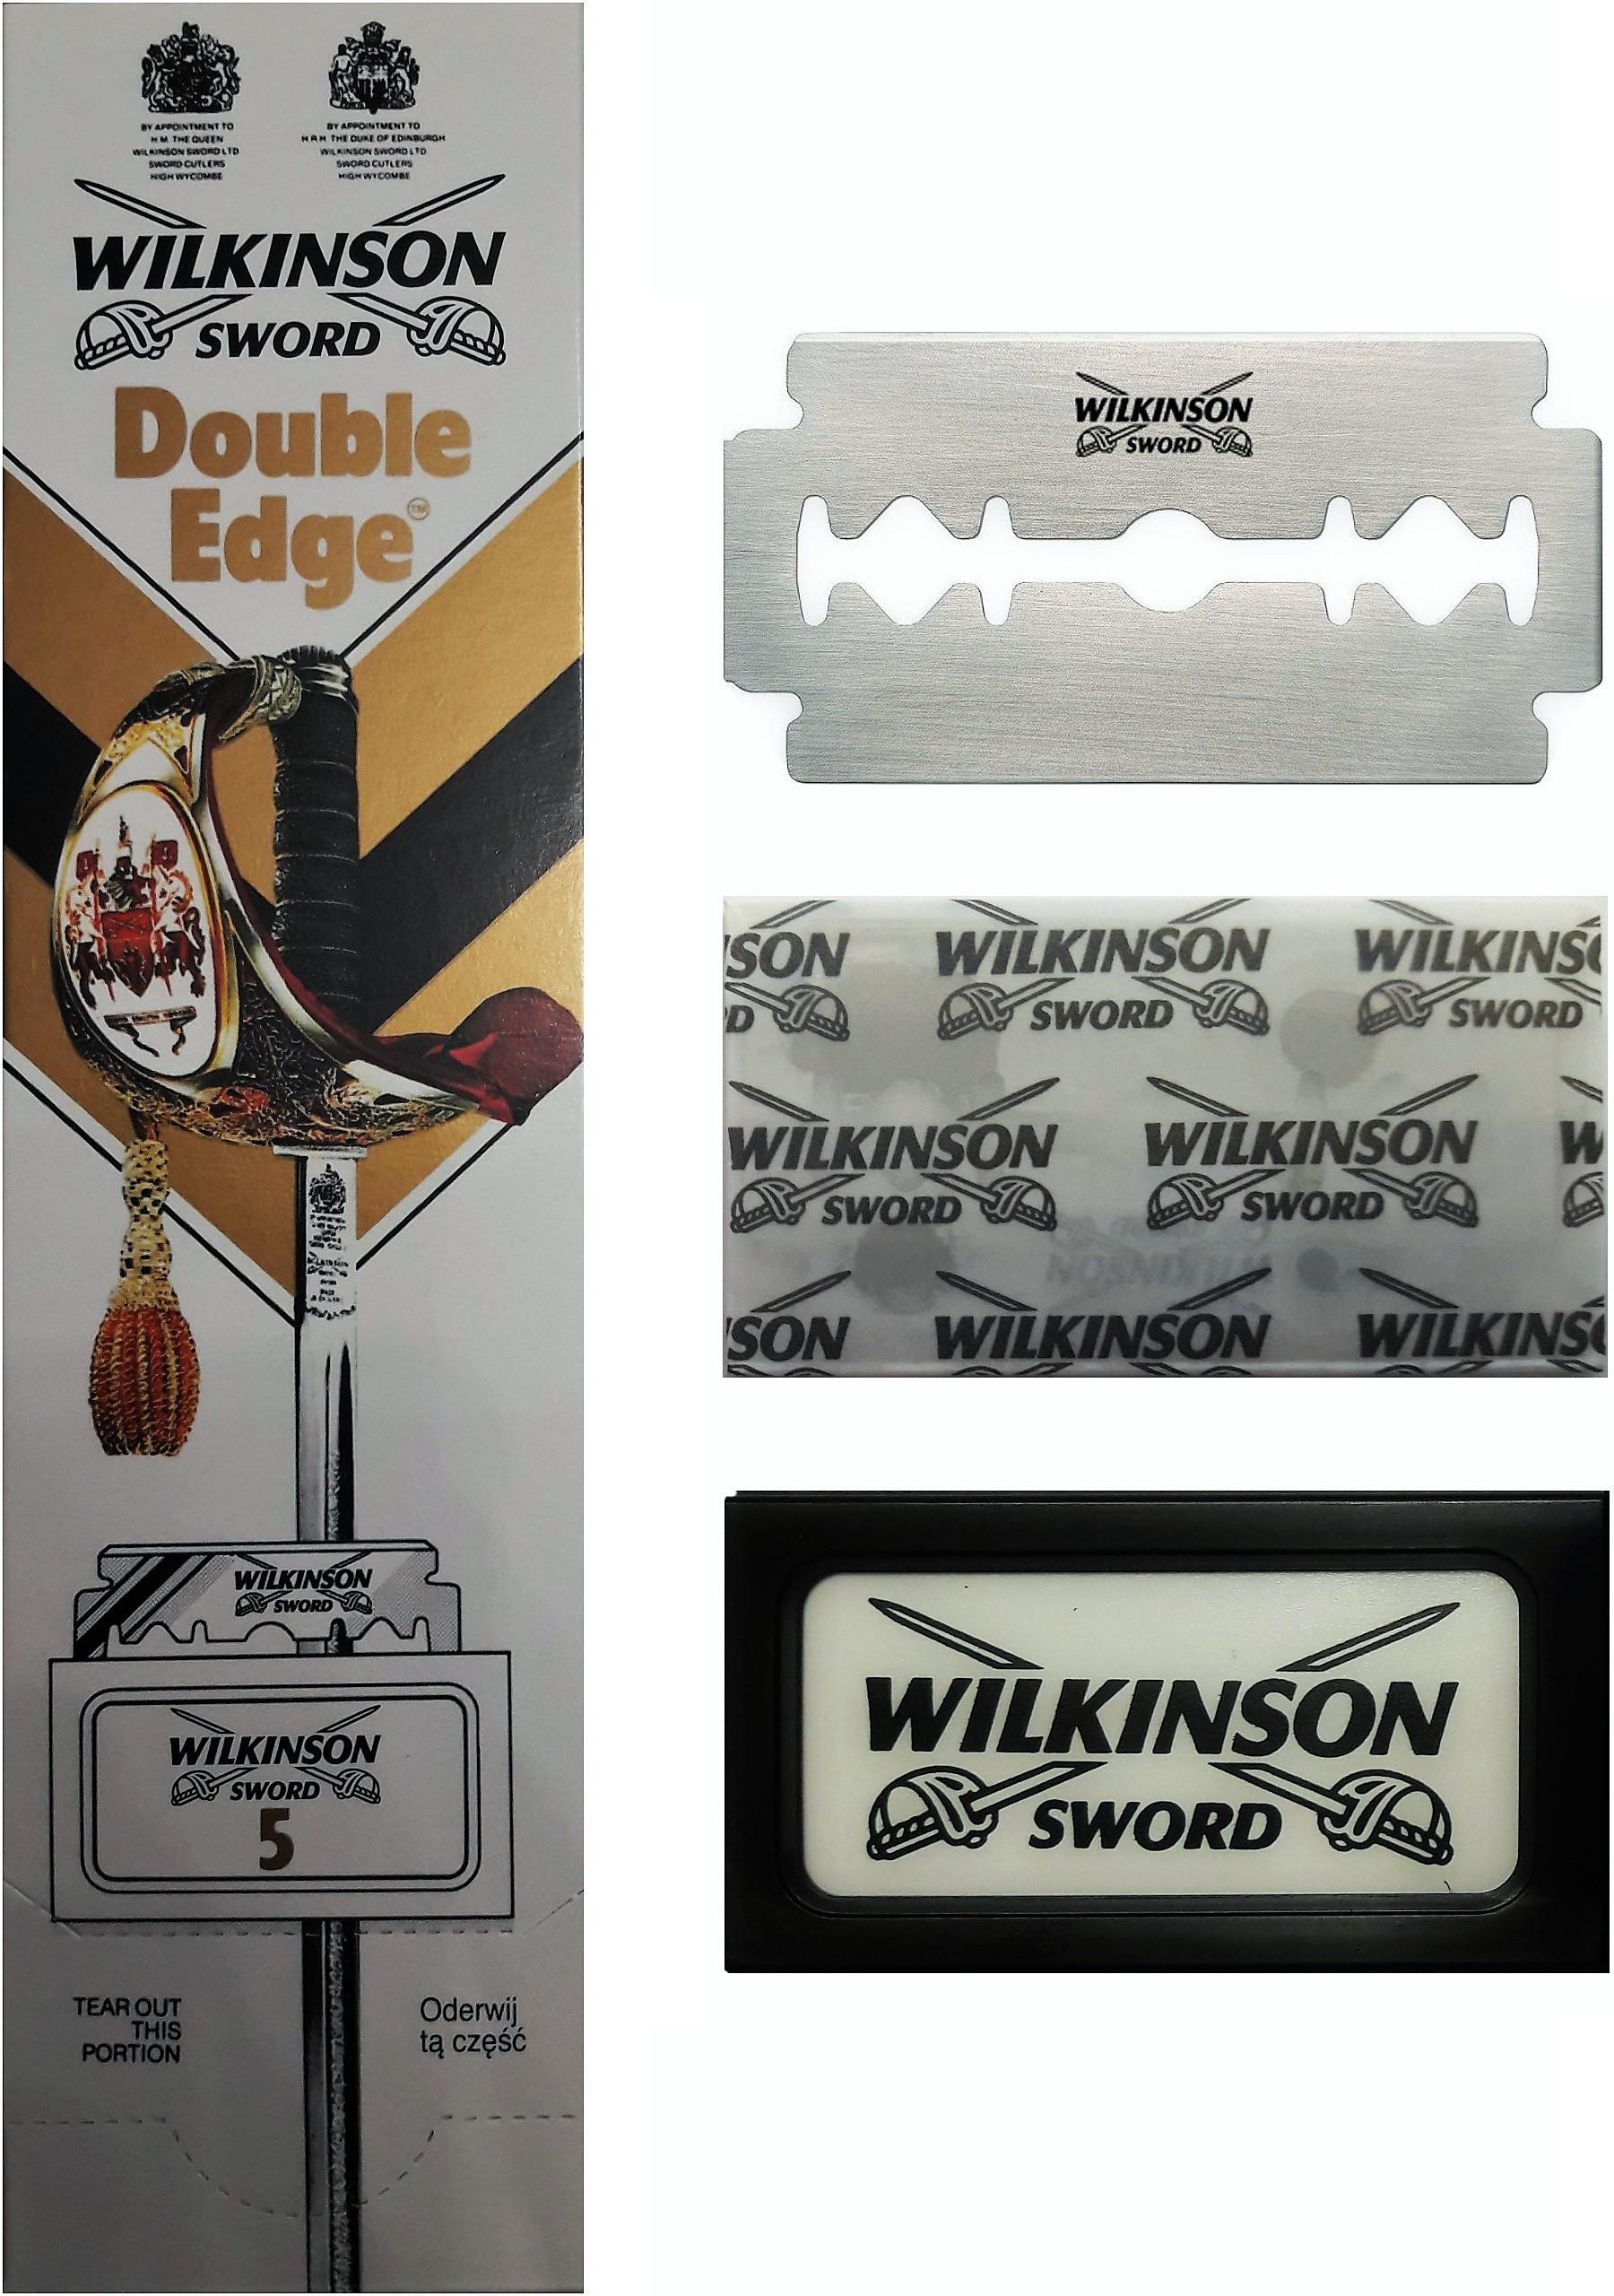 Wilkinson Sword Double*Edge /Сменные лезвия для